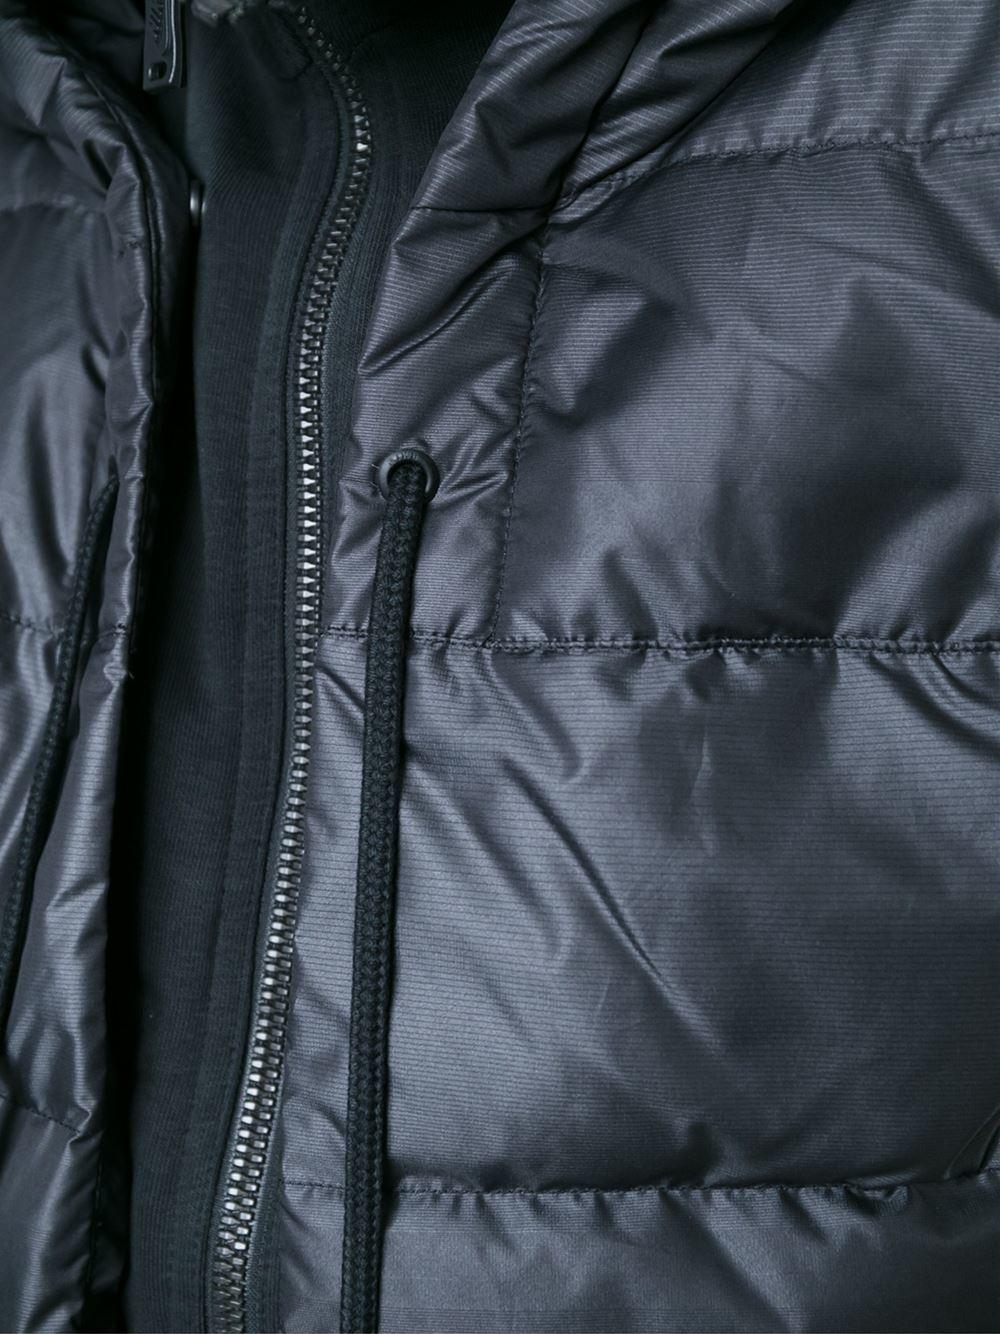 Nike Uptown 550 Padded Jacket In Black Lyst